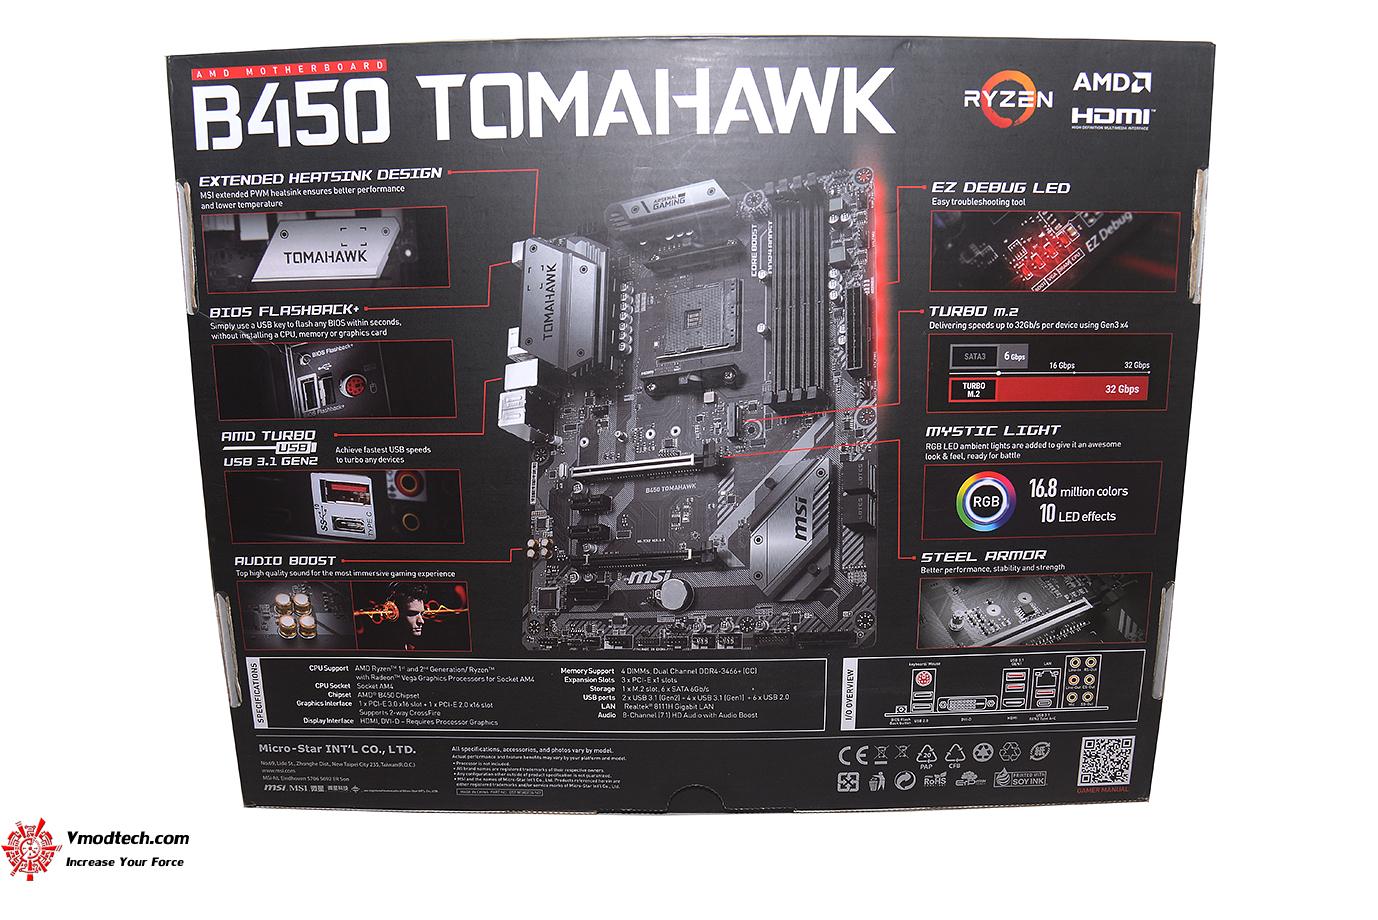 dsc 5634 MSI B450 TOMAHAWK REVIEW